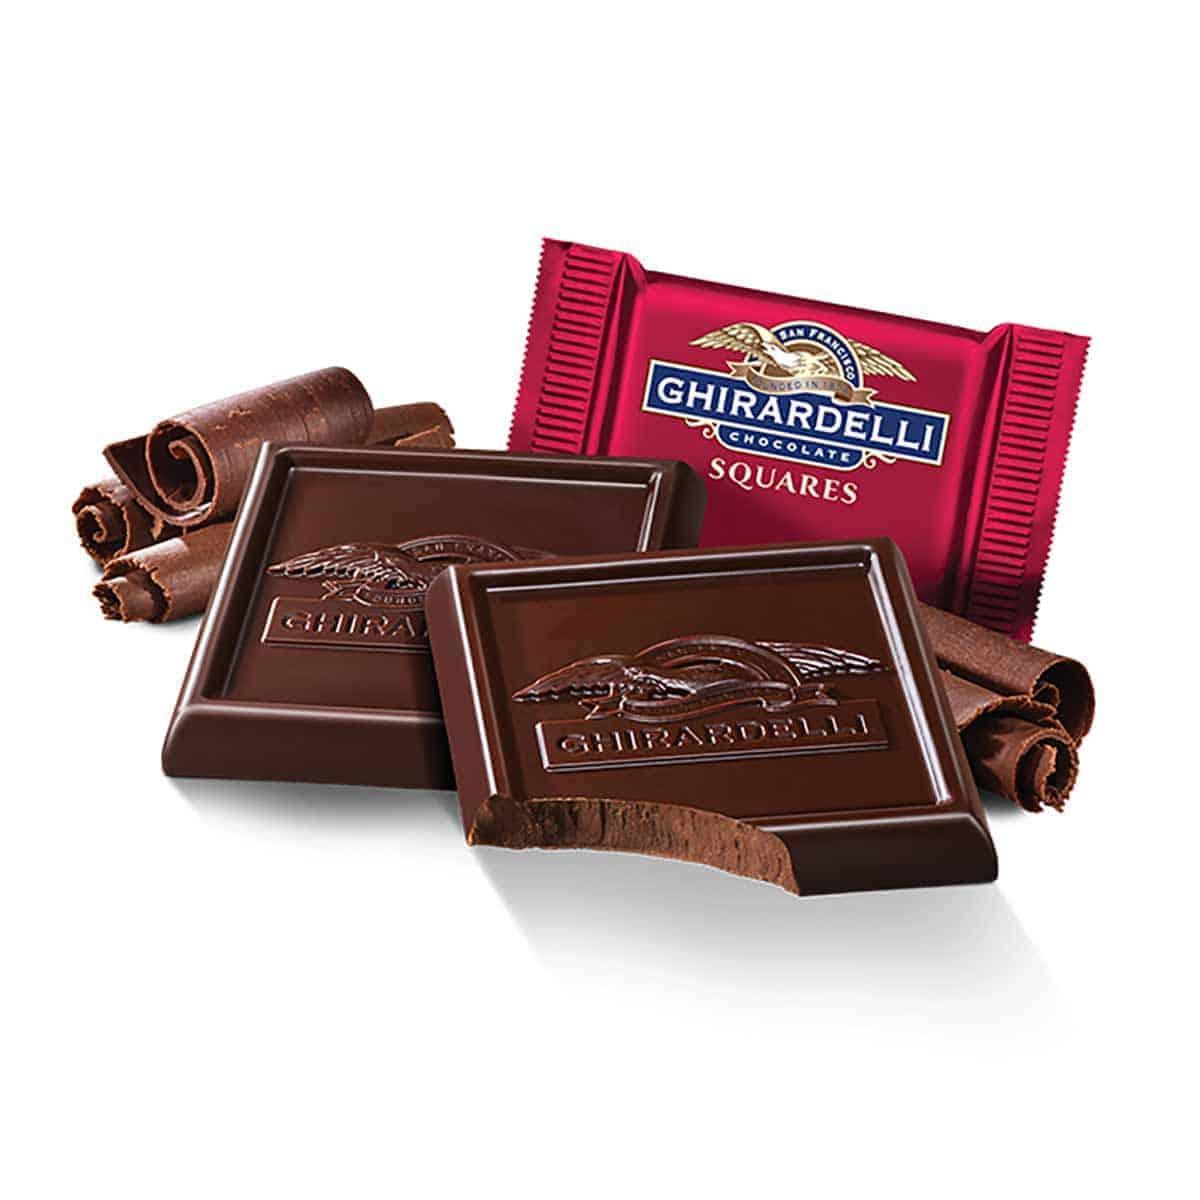 Some Chirardelli chocolate squares